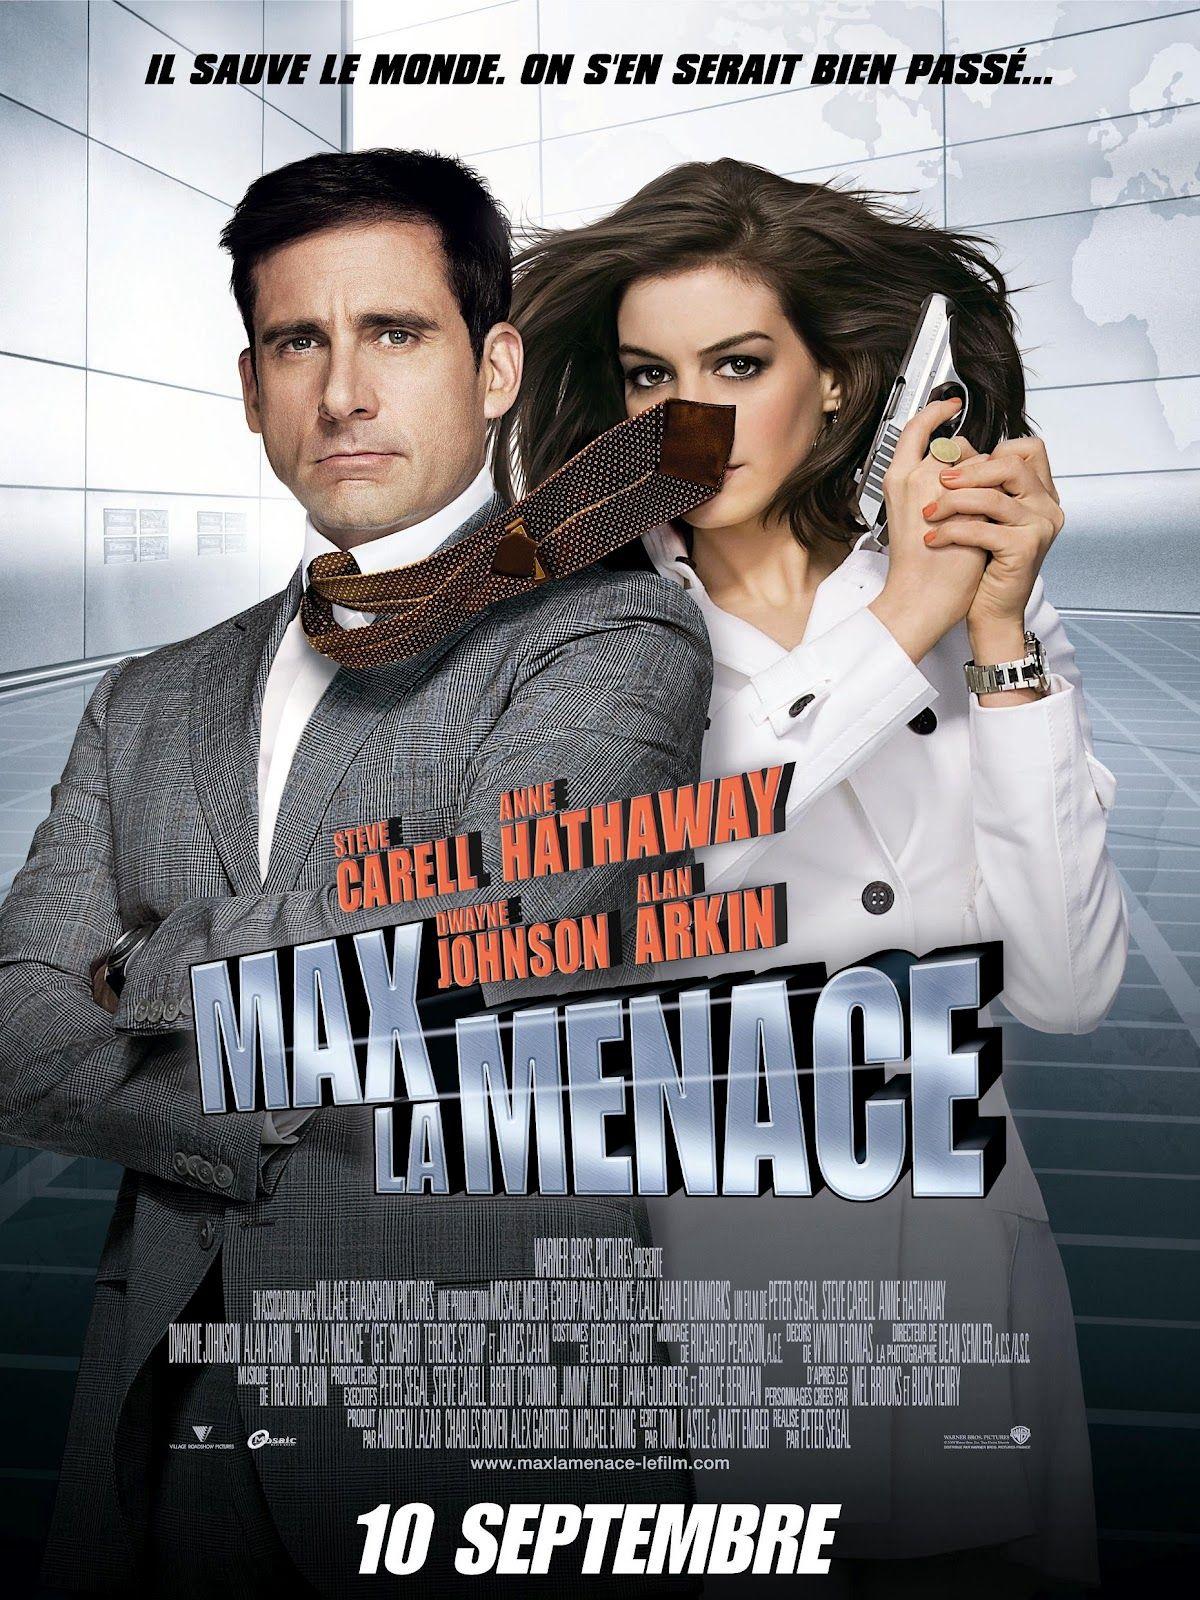 Max La Menace 20 06 2008 Regarder Le Film Film Francais Film